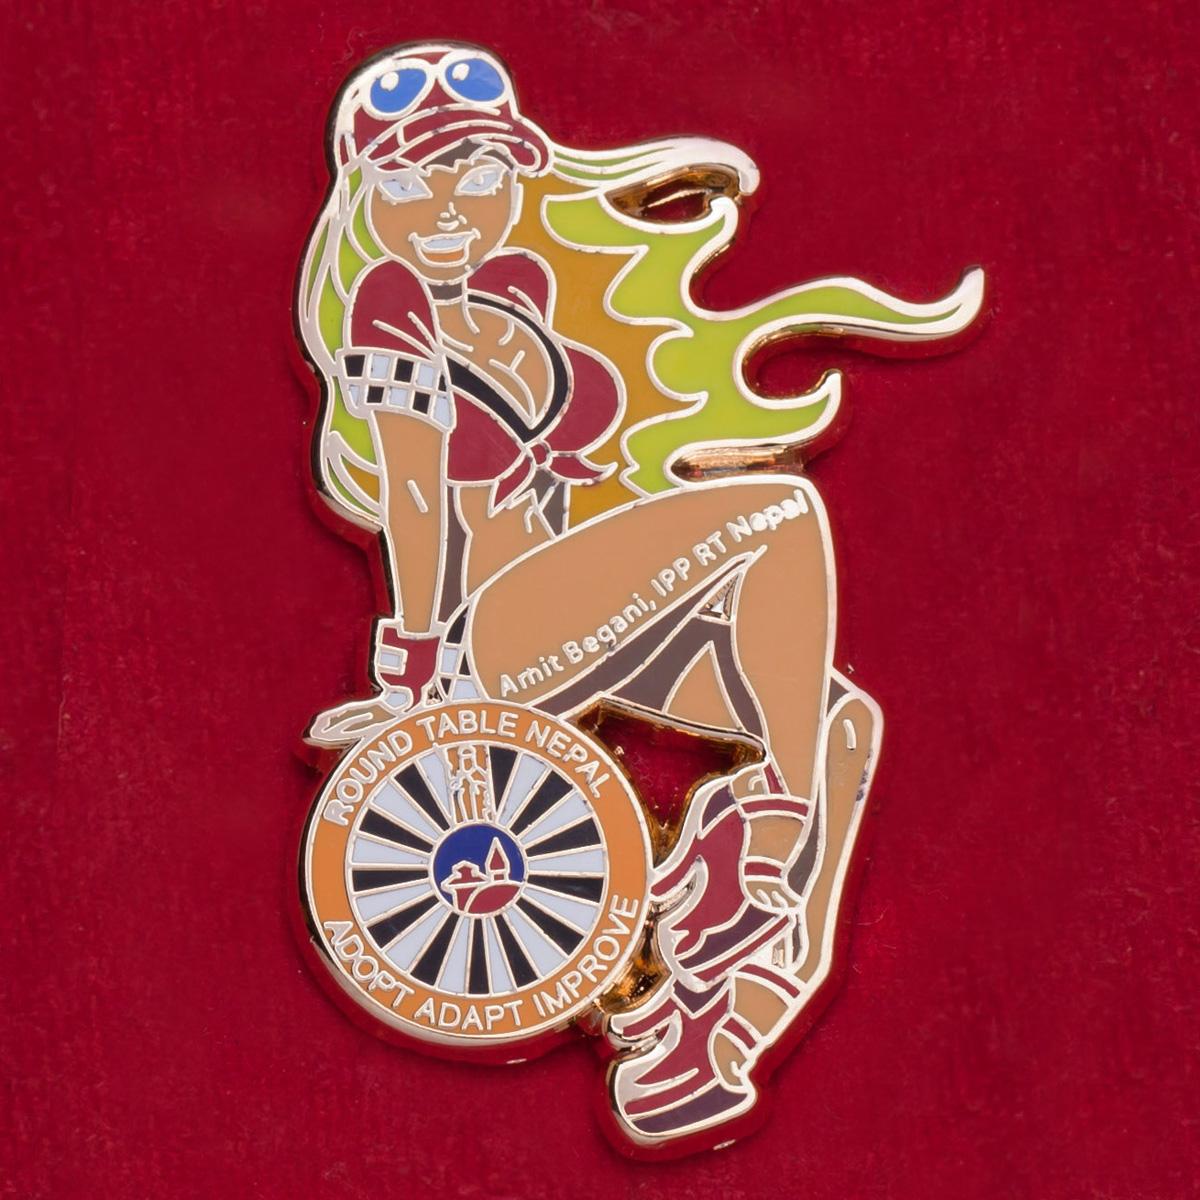 Значок с мальчишника Round Table Nepal с секси-блондинкой